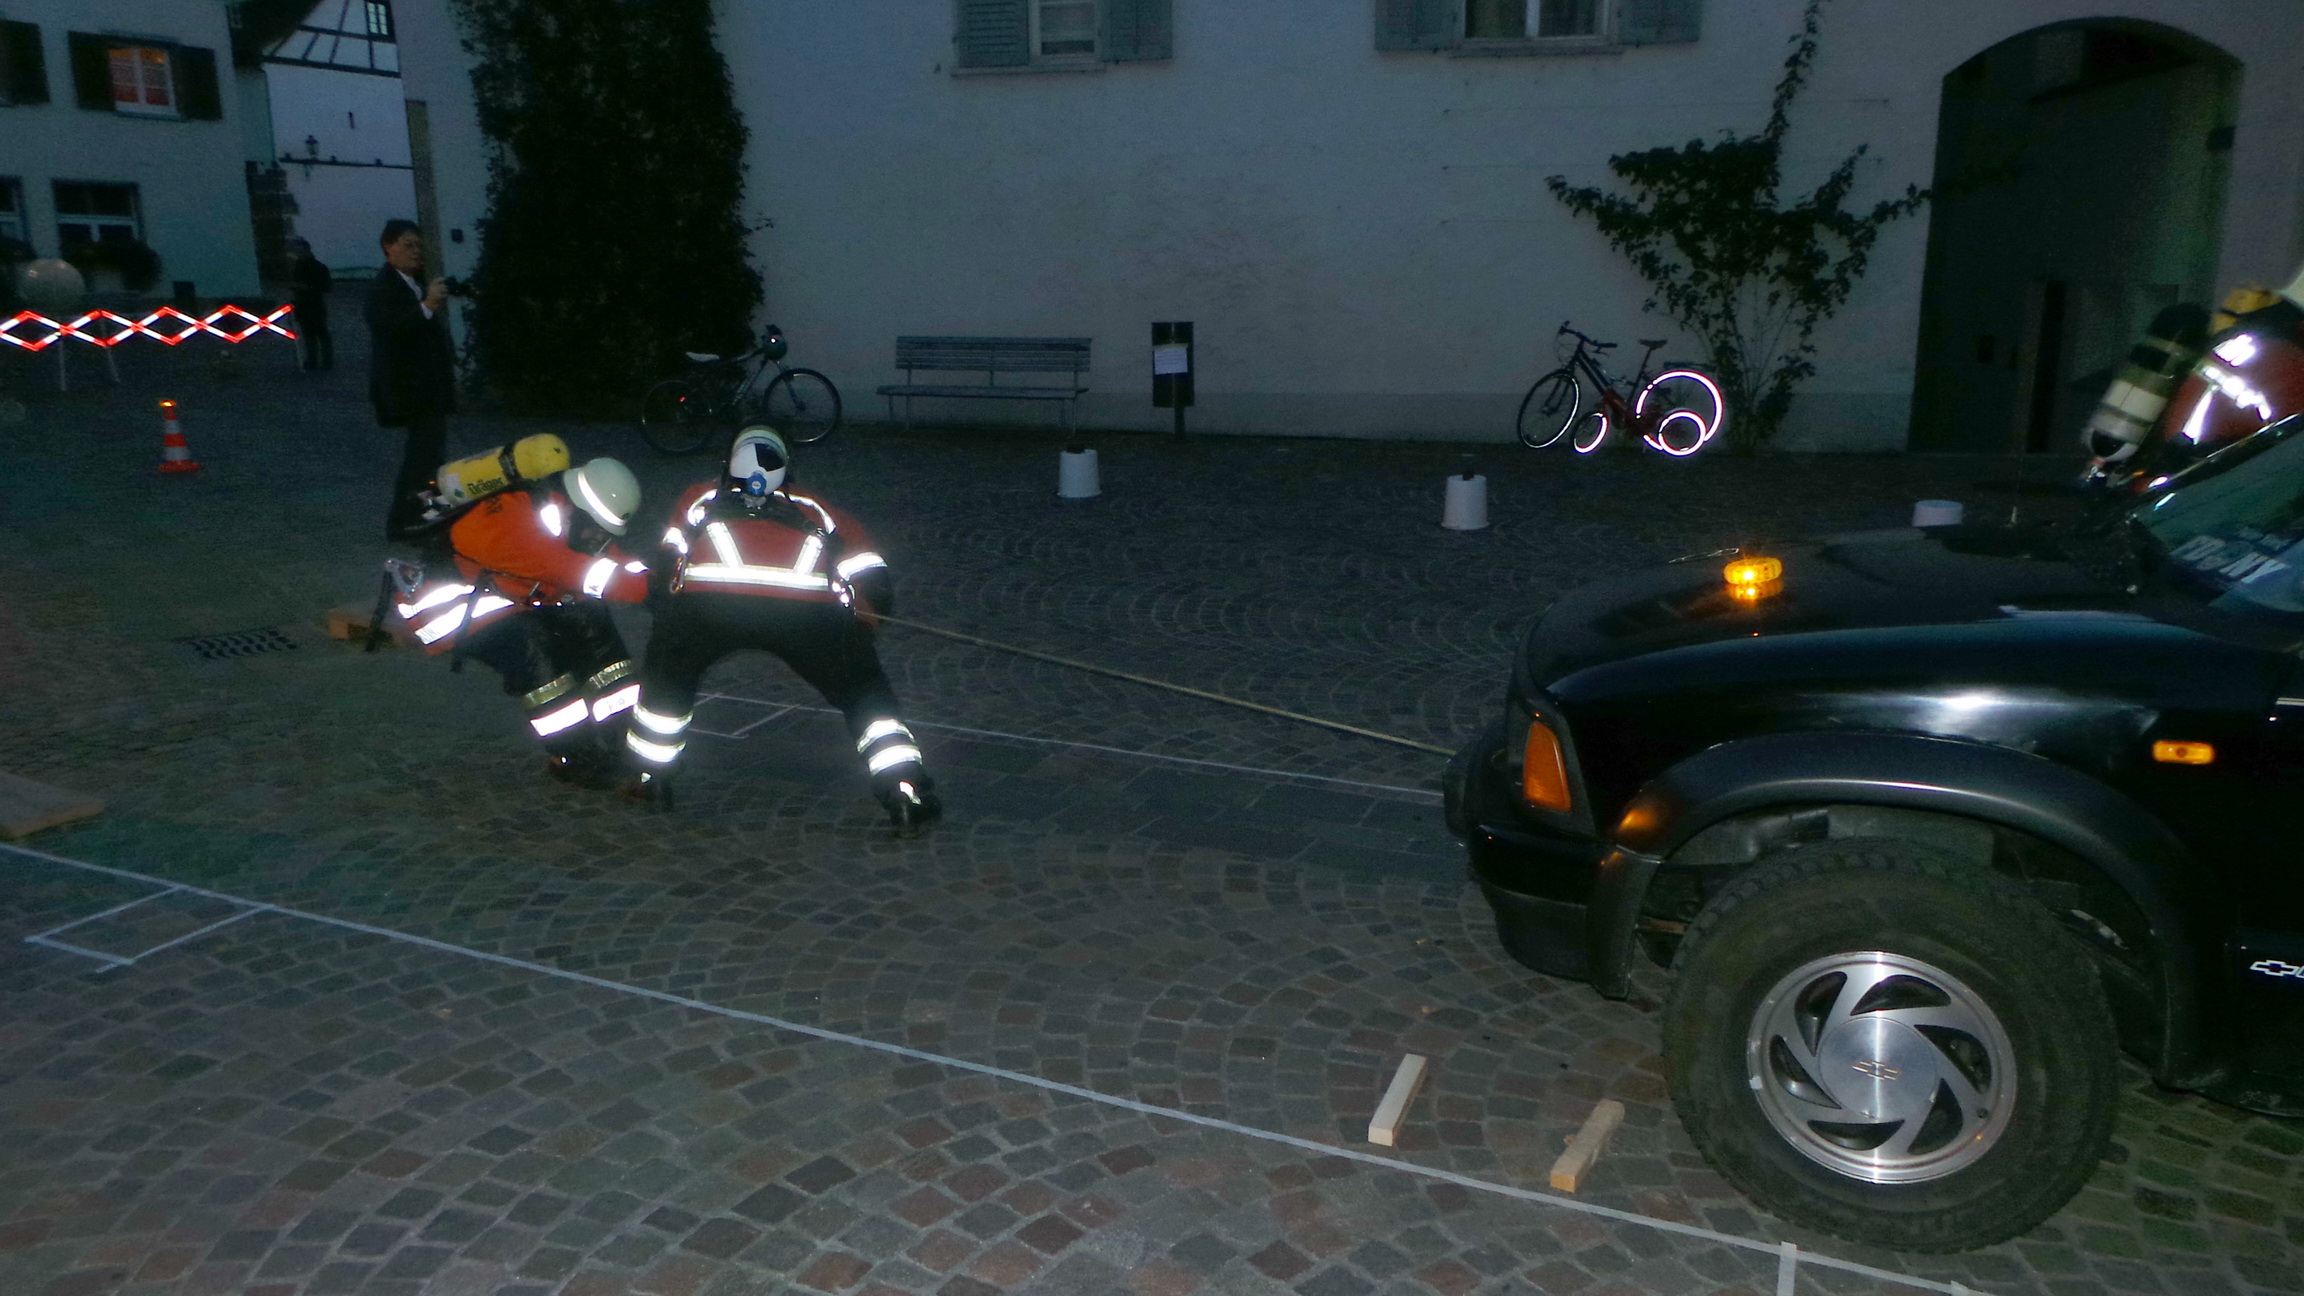 20141017 079 Atemschutzpokal 2014